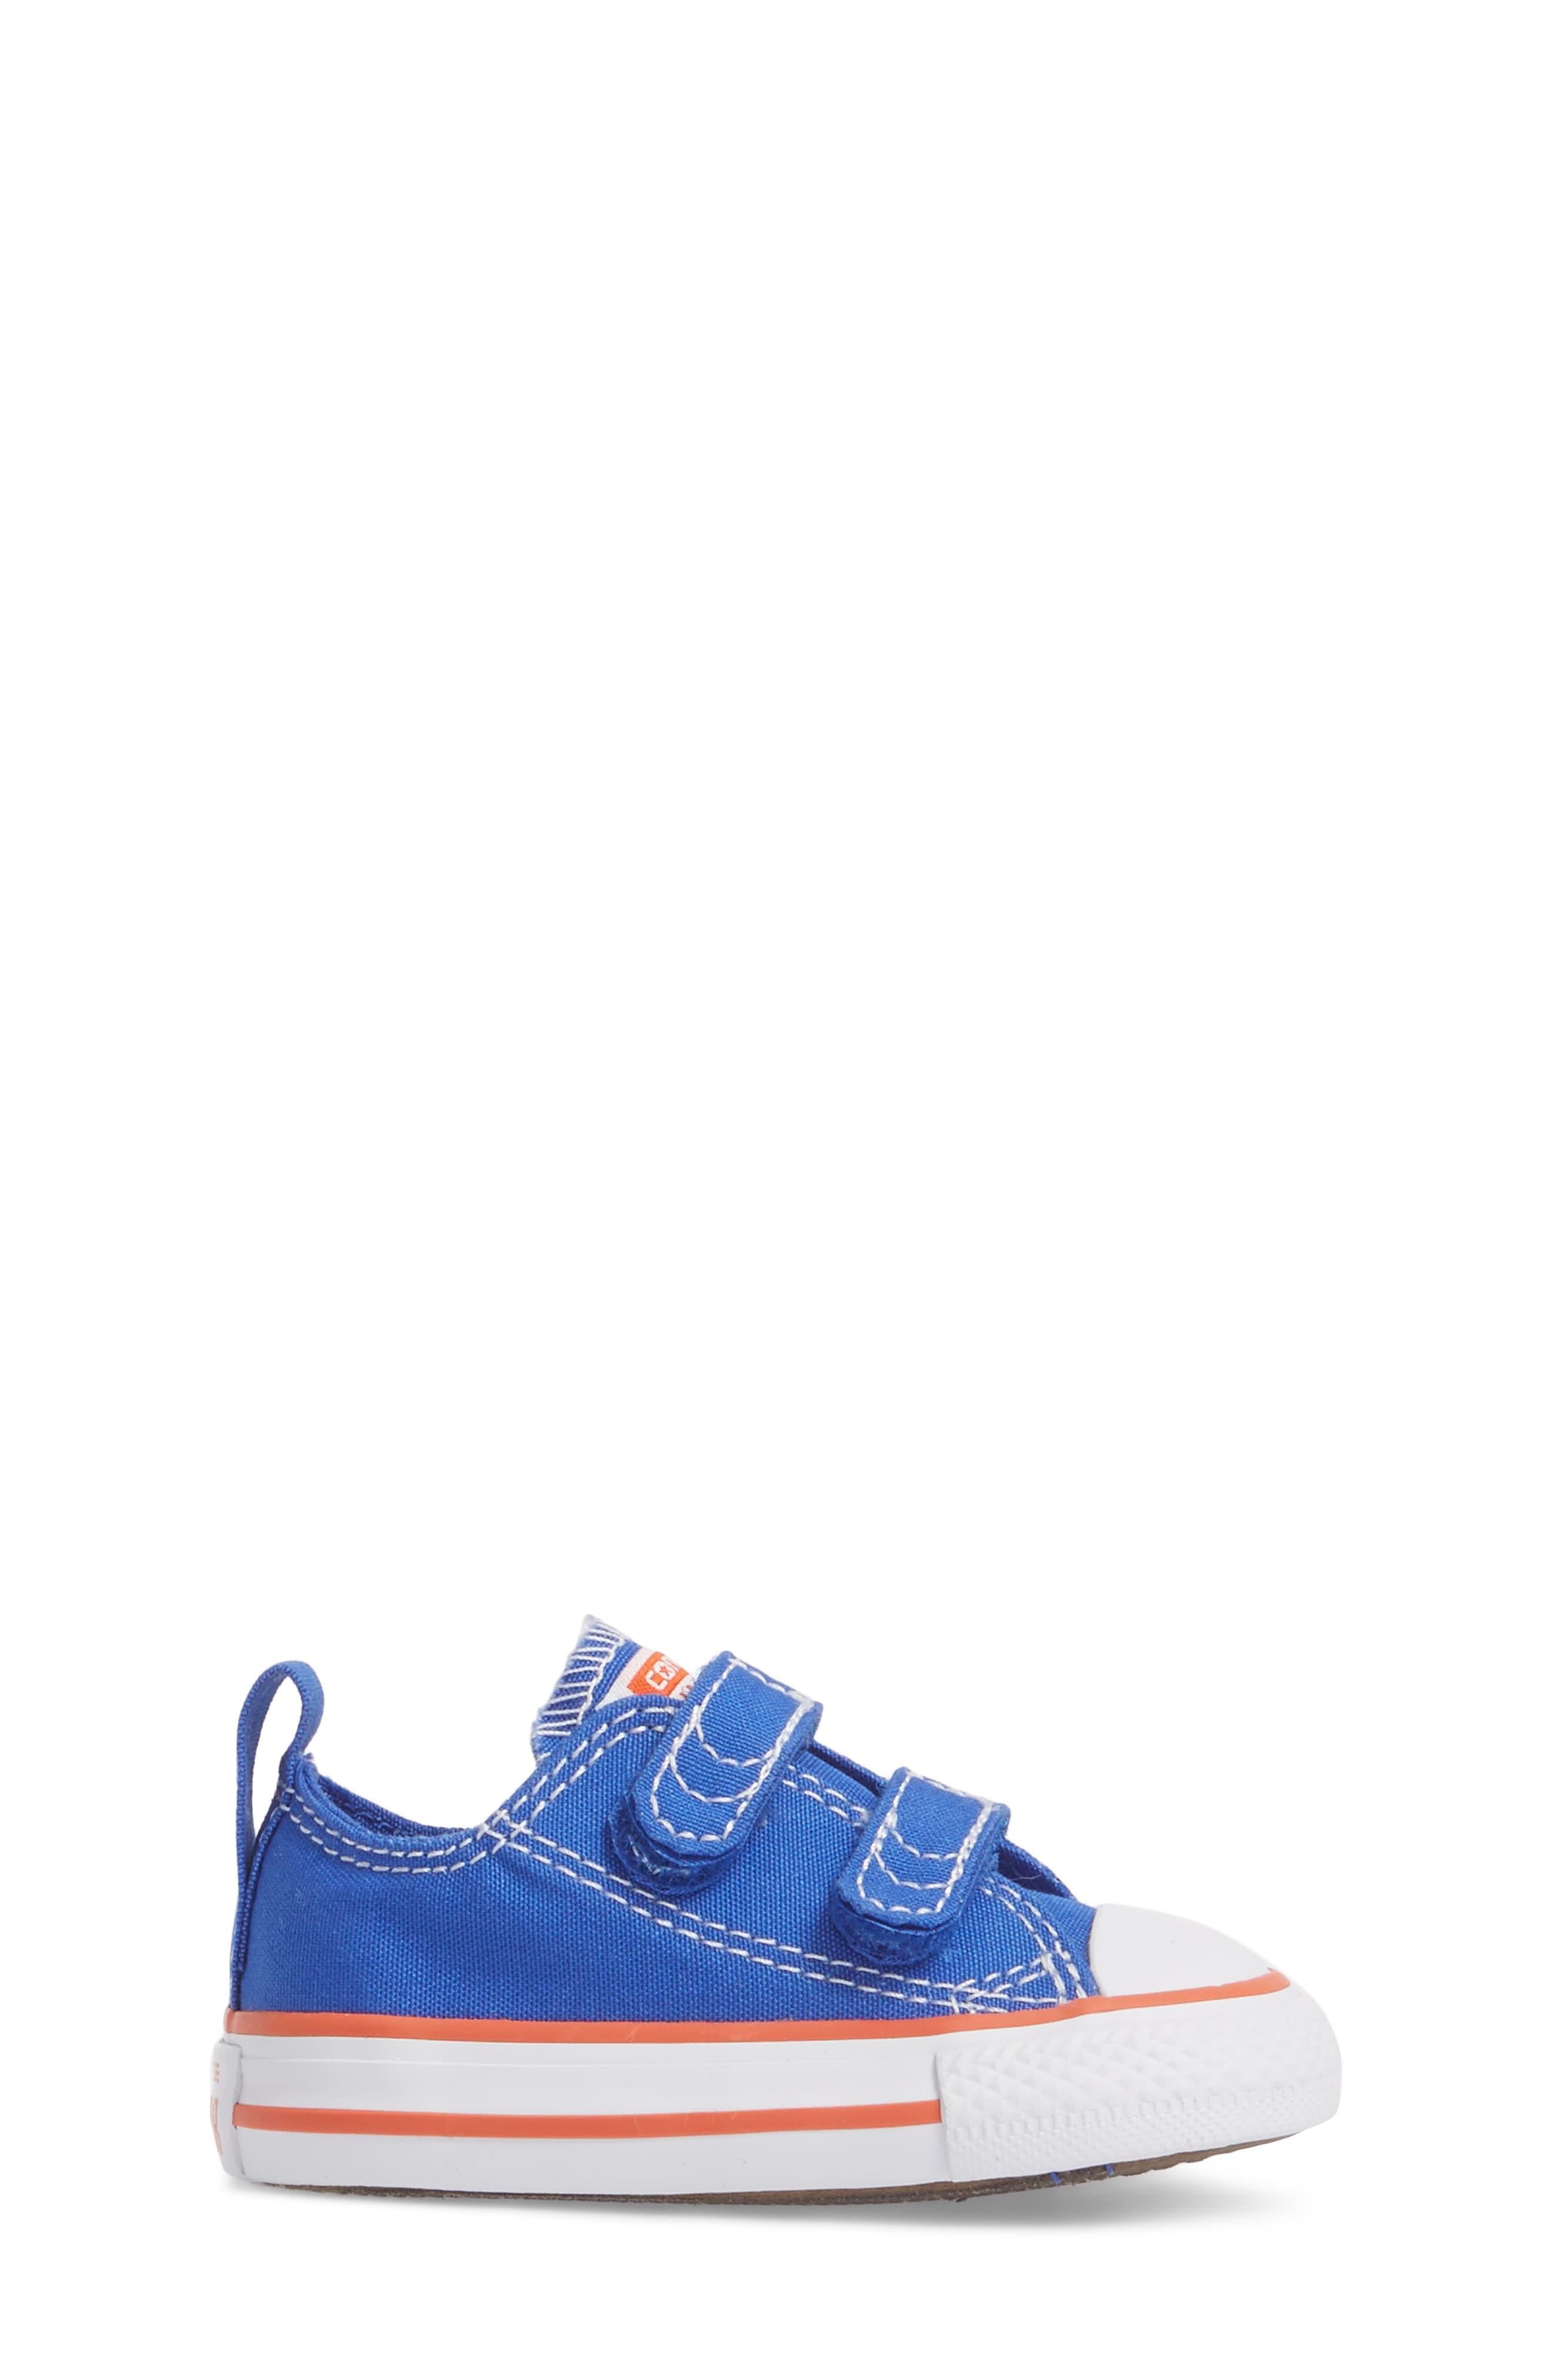 Chuck Taylor<sup>®</sup> All Star<sup>®</sup> Seasonal 2V Low Top Sneaker,                             Alternate thumbnail 3, color,                             483